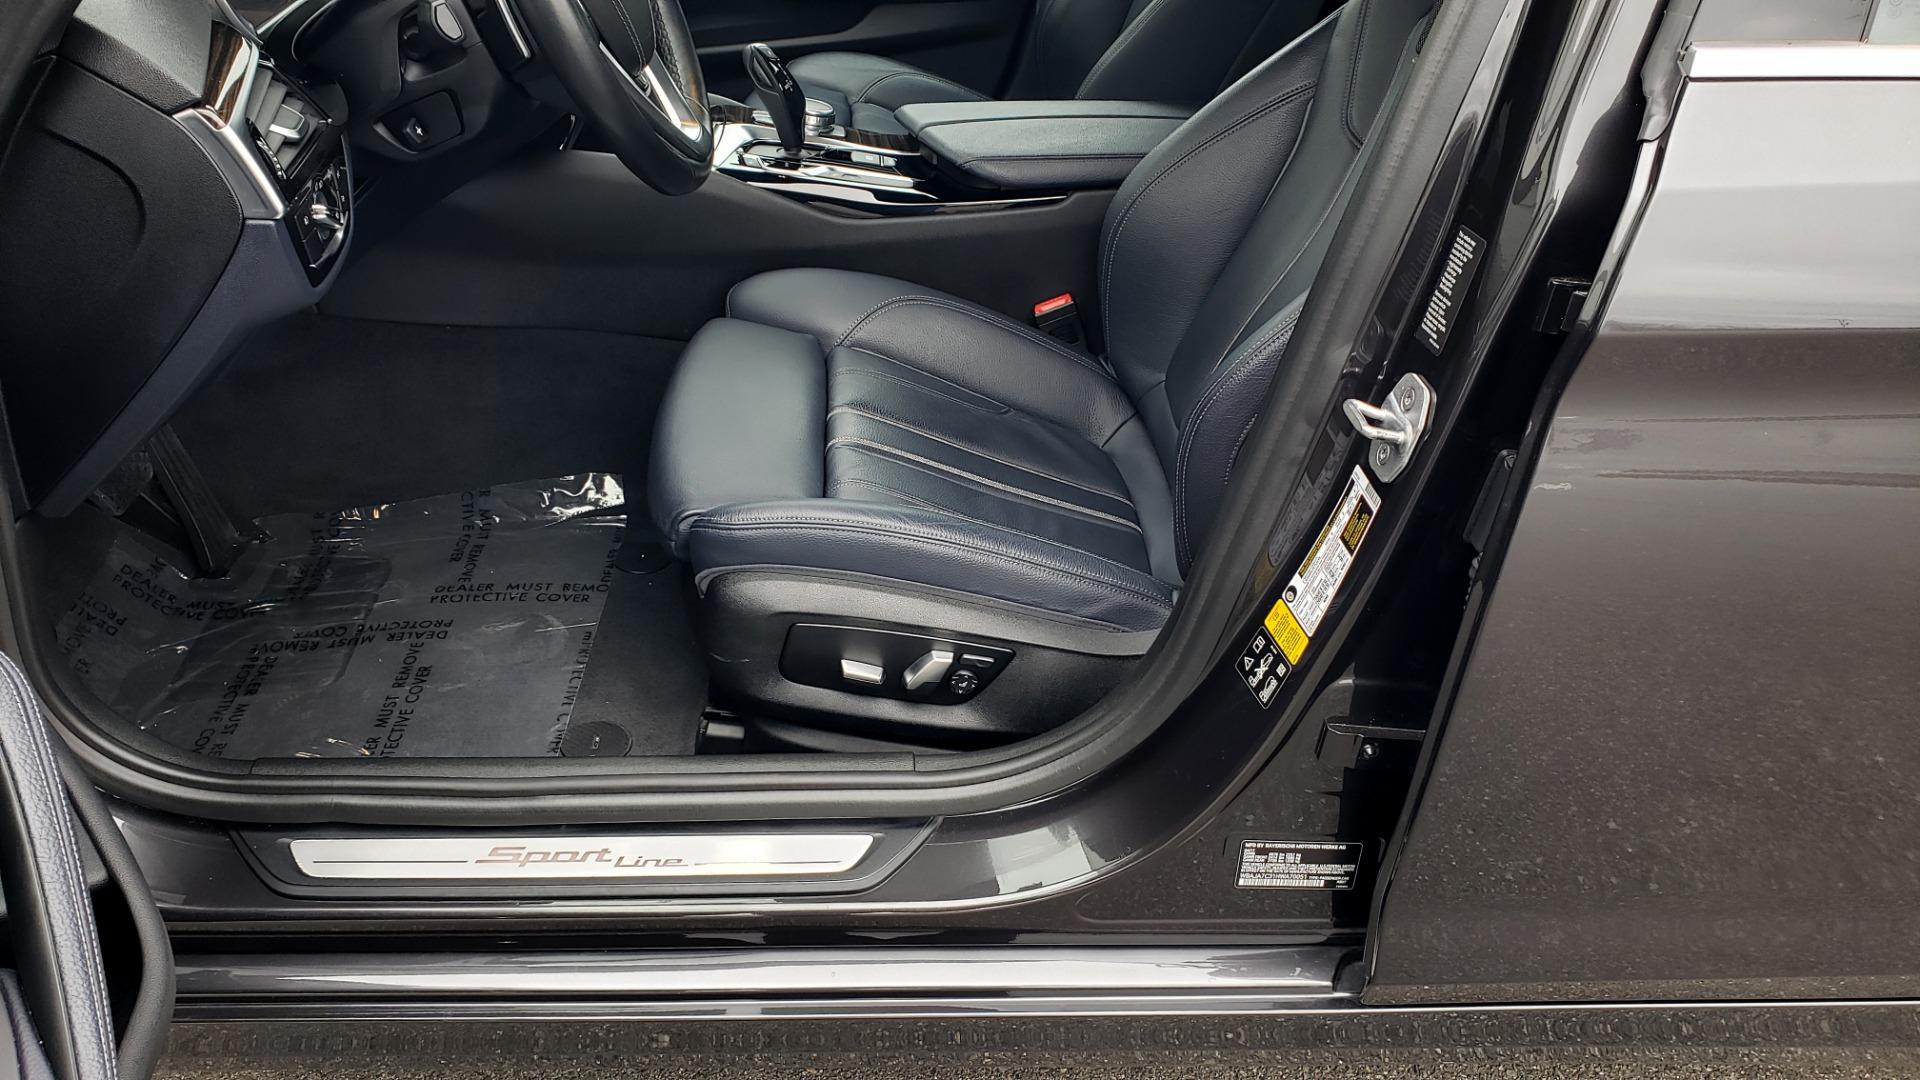 Used 2017 BMW 5 SERIES 530IXDRIVE / PREM PKG / DRVR ASST PLUS / CLD WTHR / APPLE CARPLAY for sale Sold at Formula Imports in Charlotte NC 28227 33